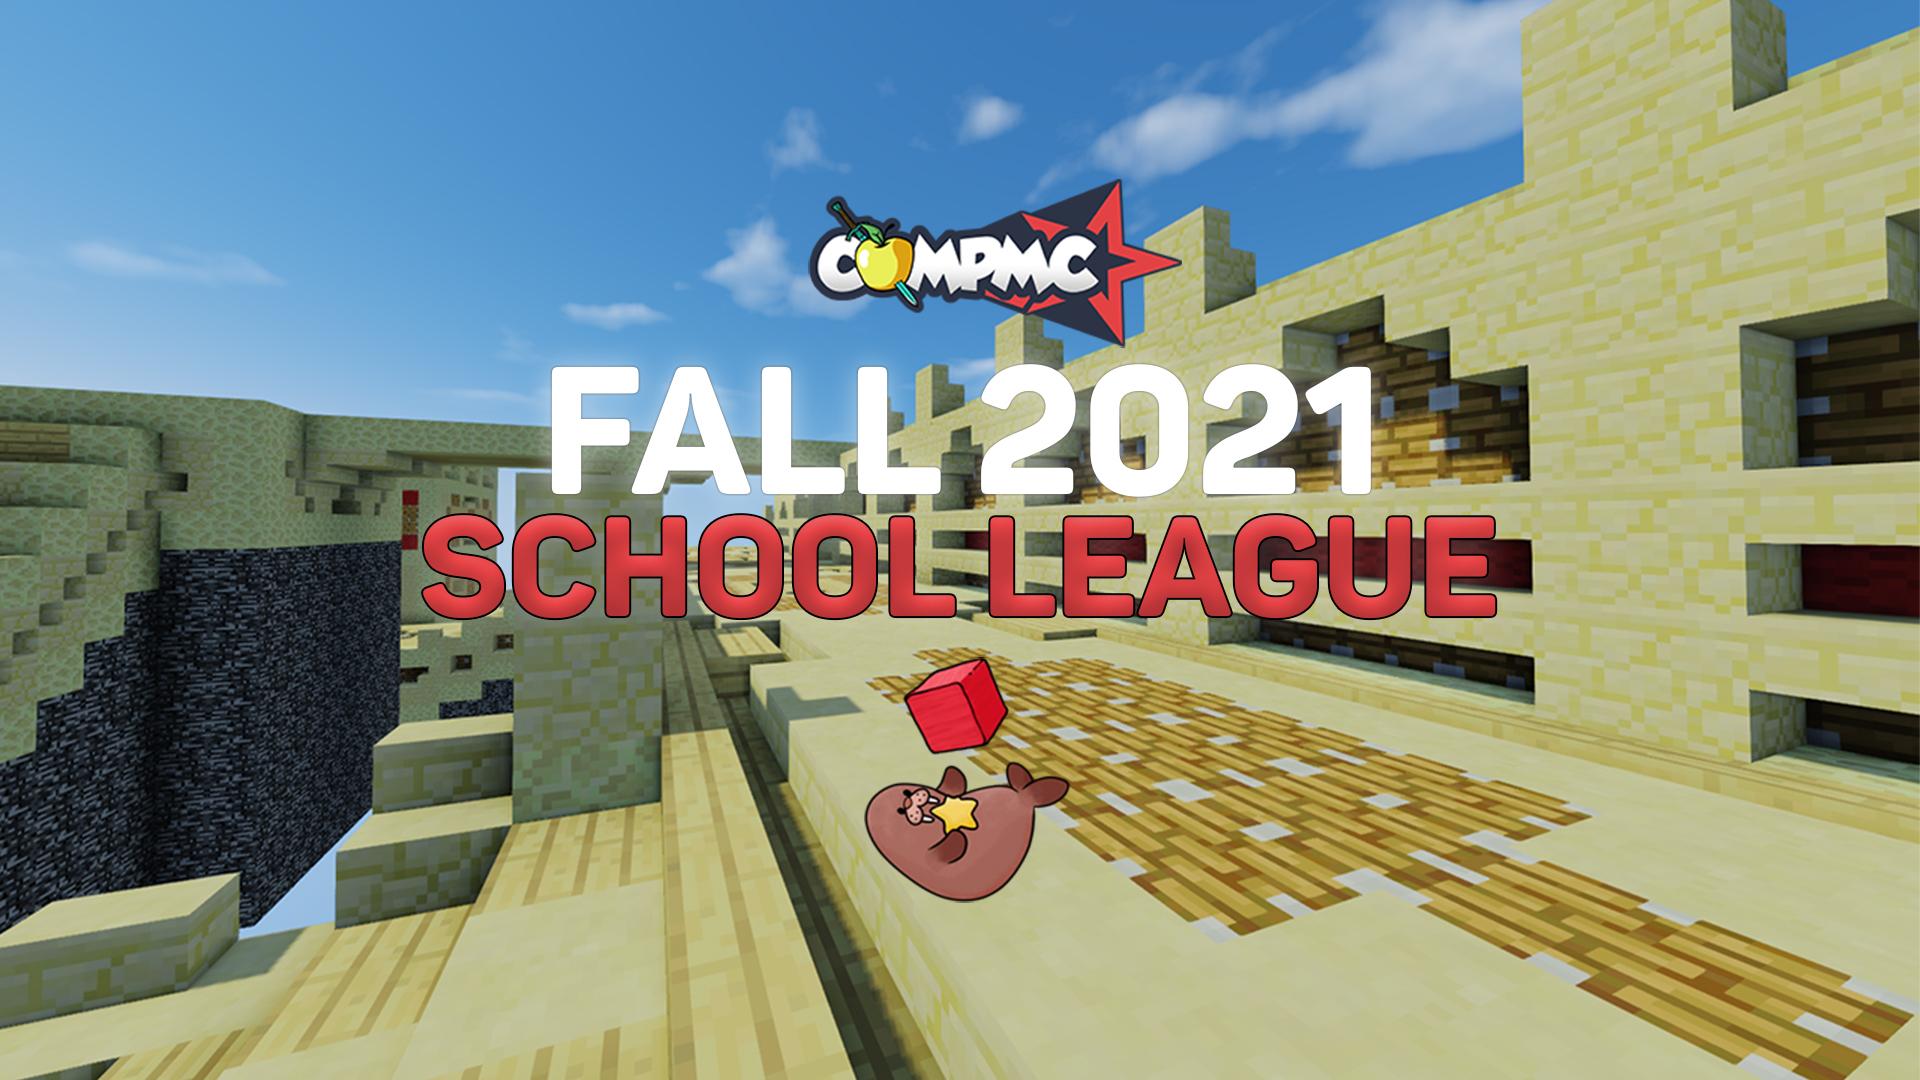 School League Fall 2021 Cover Image